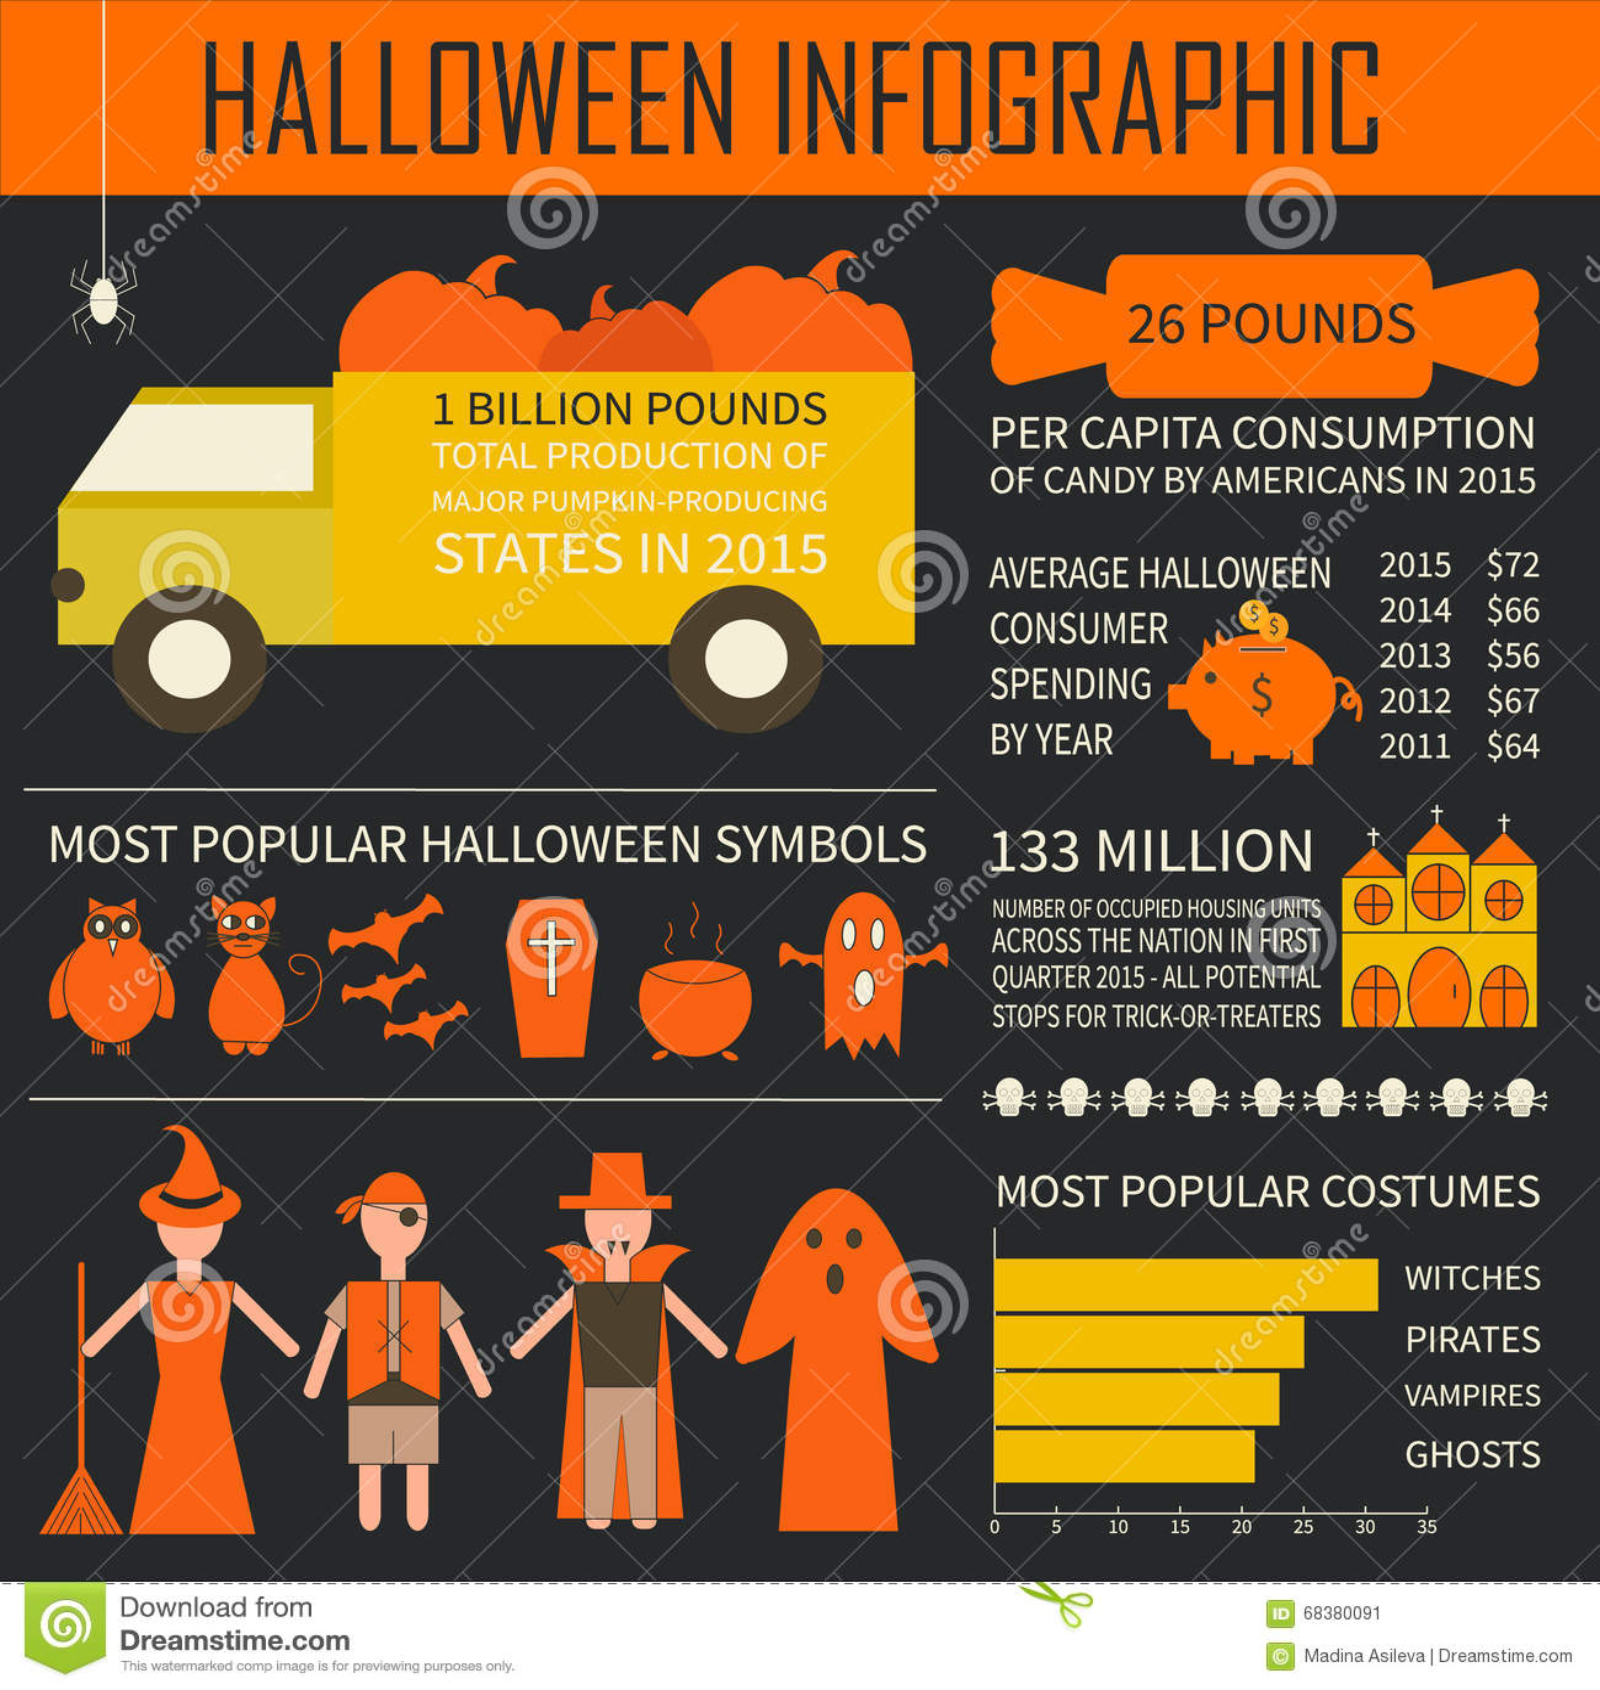 Halloween Infographic - Sample Data, Symbols, Pumpkins Stock Vector ...